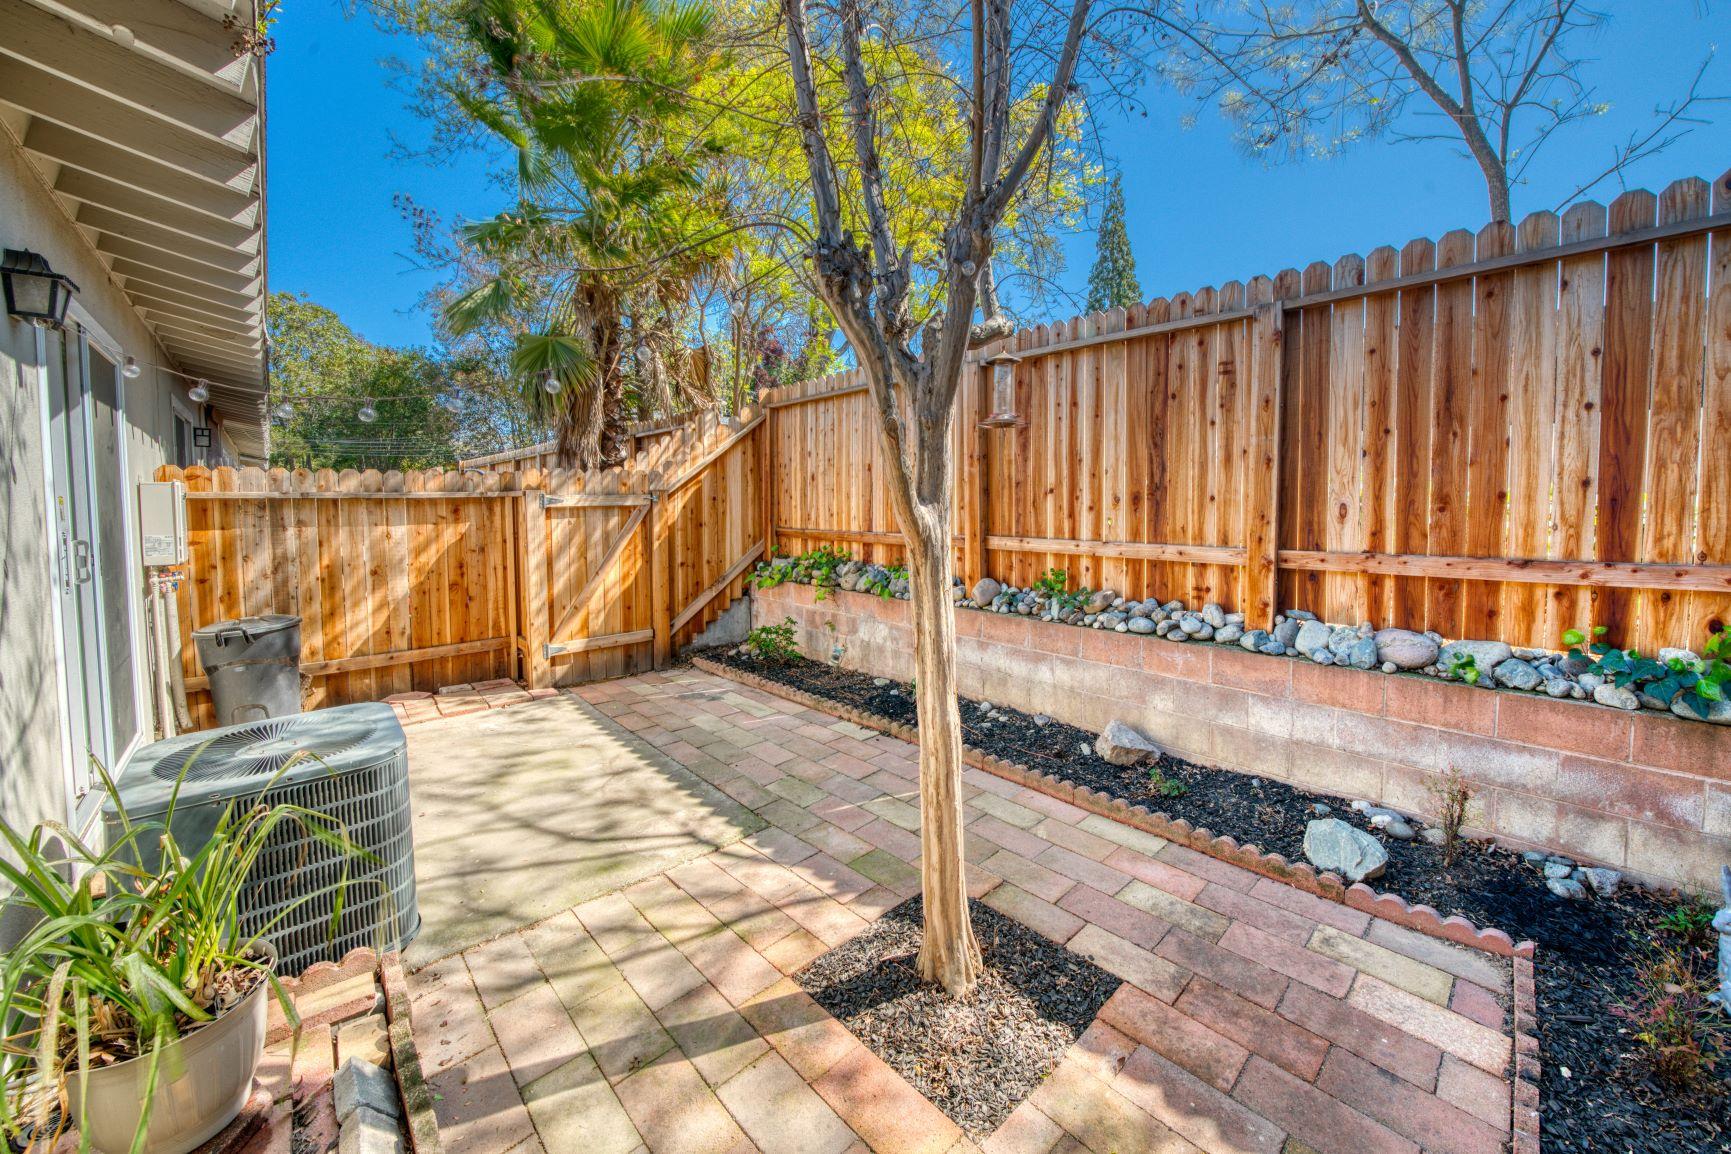 South Hills Manor Condominium backyard patio